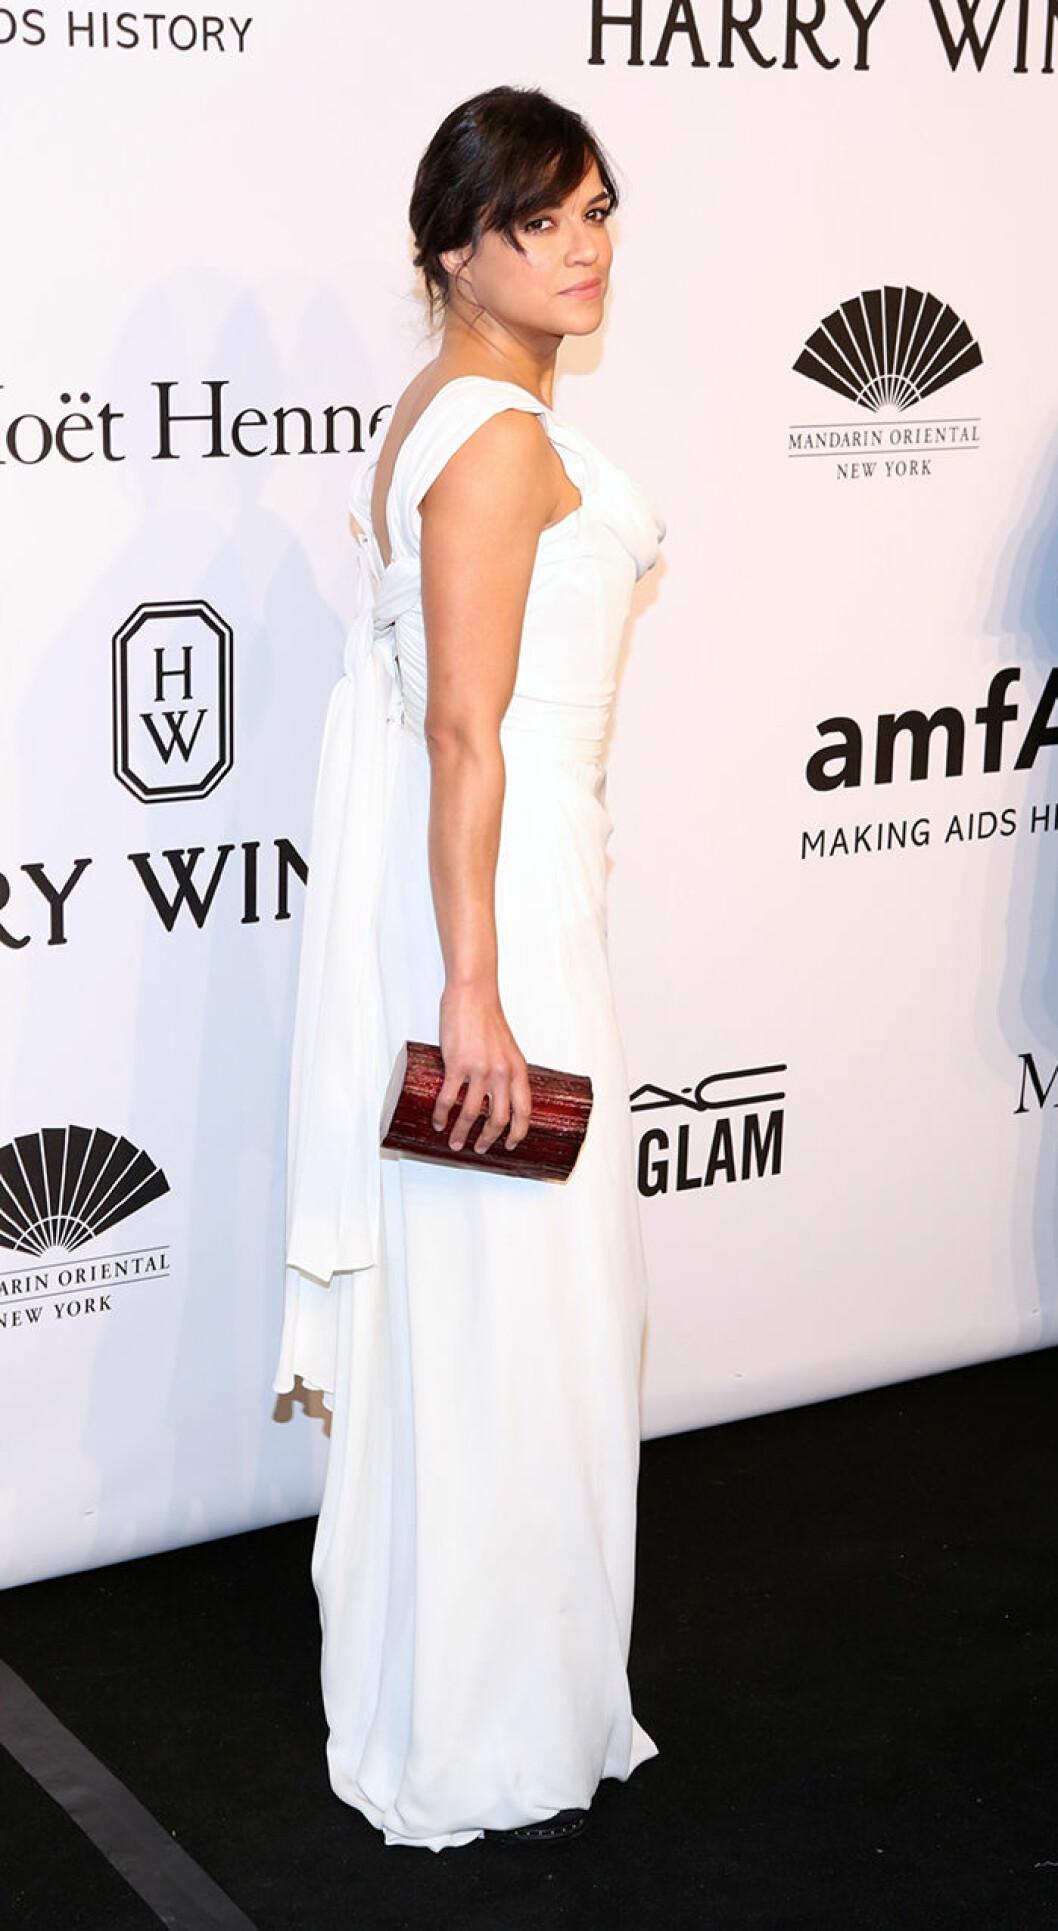 Michelle Rodriguez seen attending the 2015 amfAR New York Gala at Cipriani Wall Street